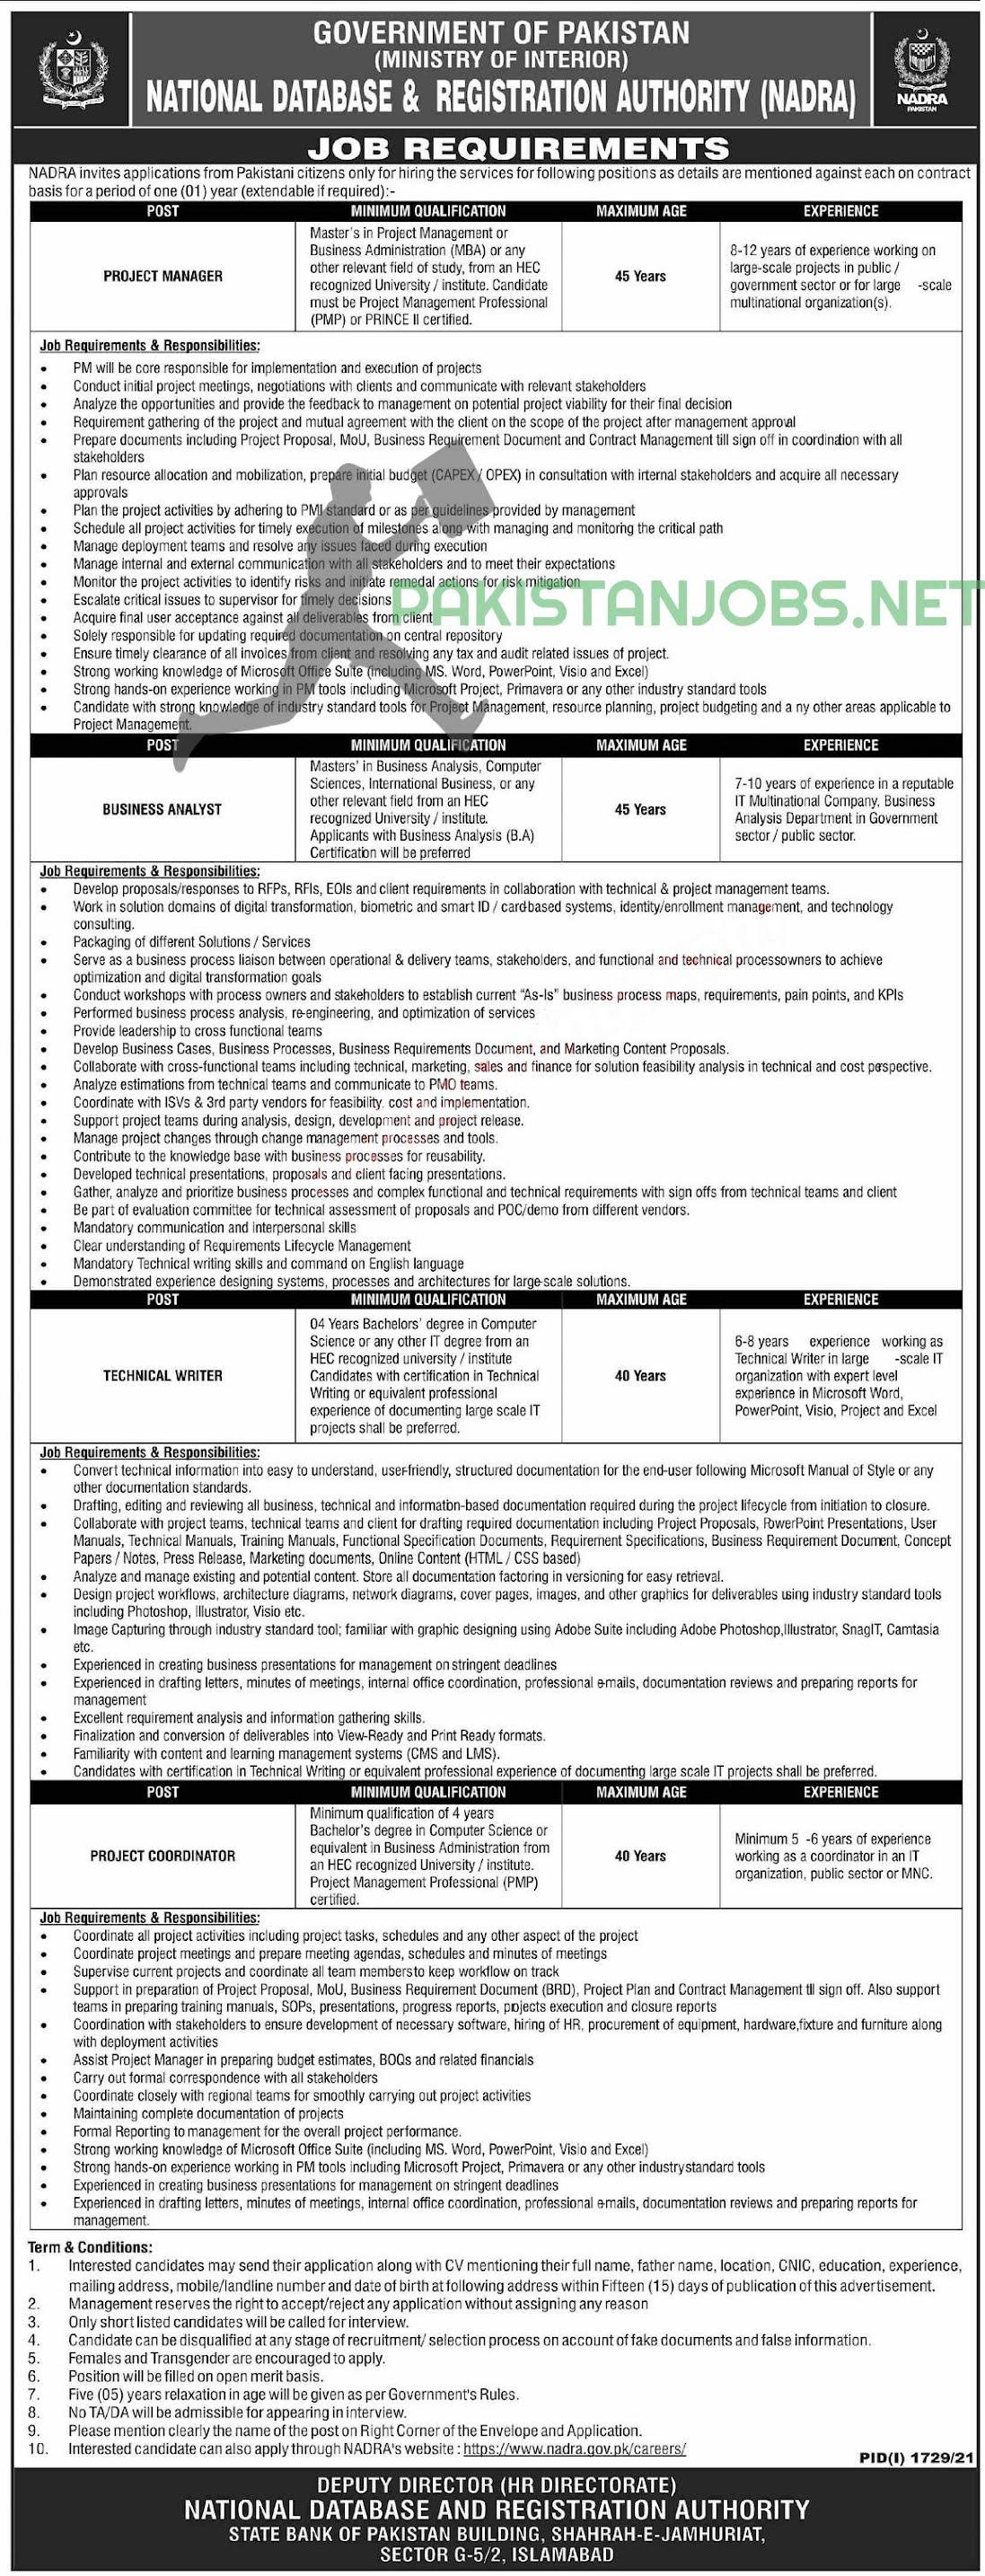 NADRA Islamabad Ministry of Interior Jobs 2021